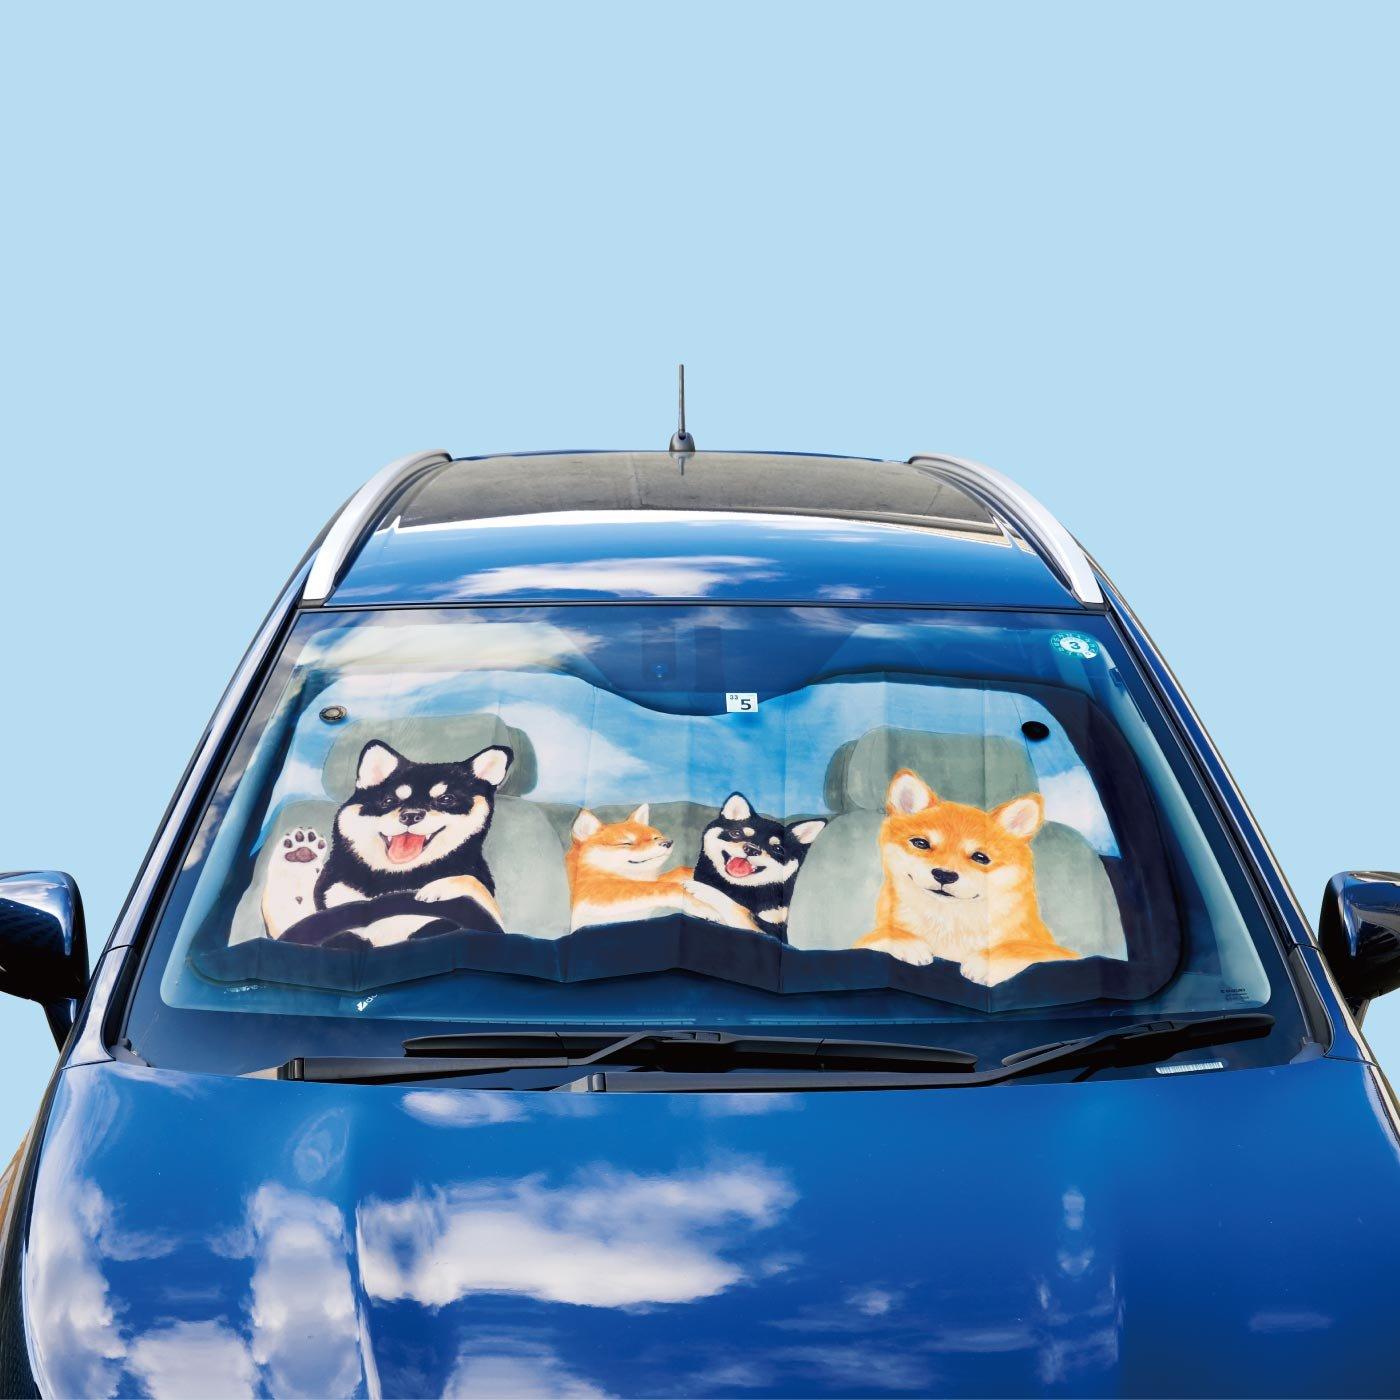 YOU+MORE! 一緒にドライブ気分の柴犬ワンシェード〈フロントガラス用〉